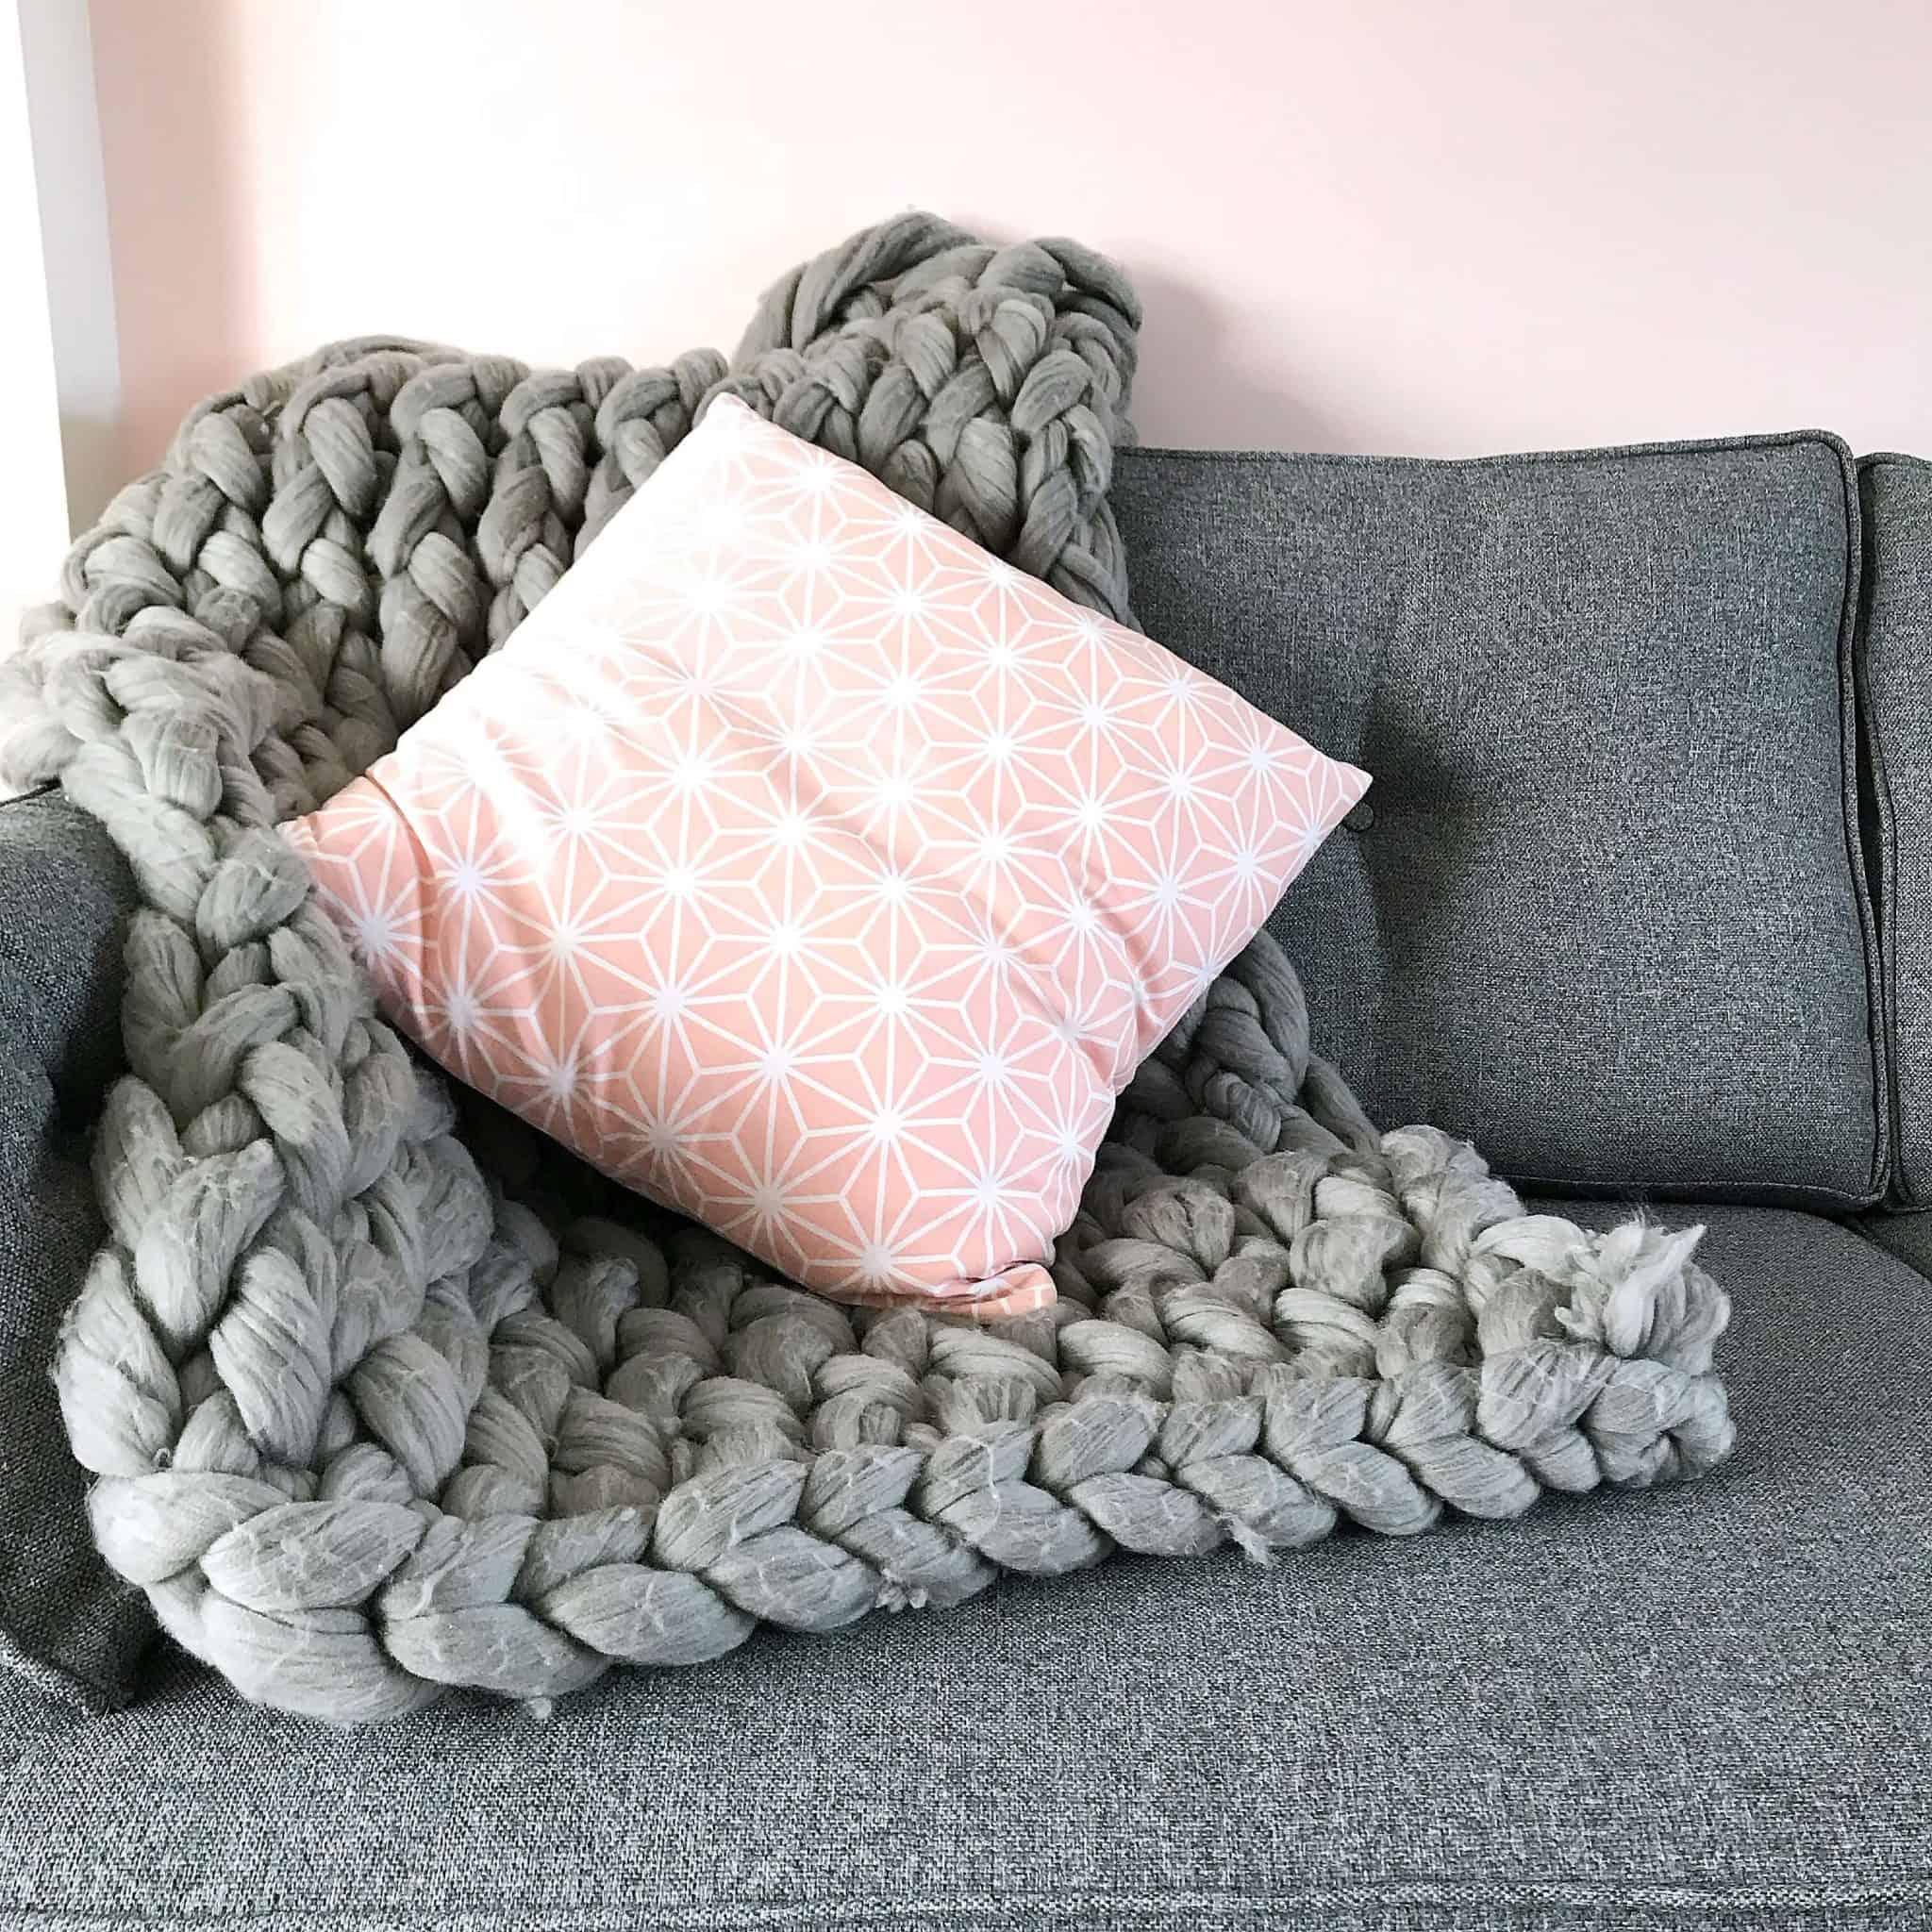 Charcoal Zinc sofa